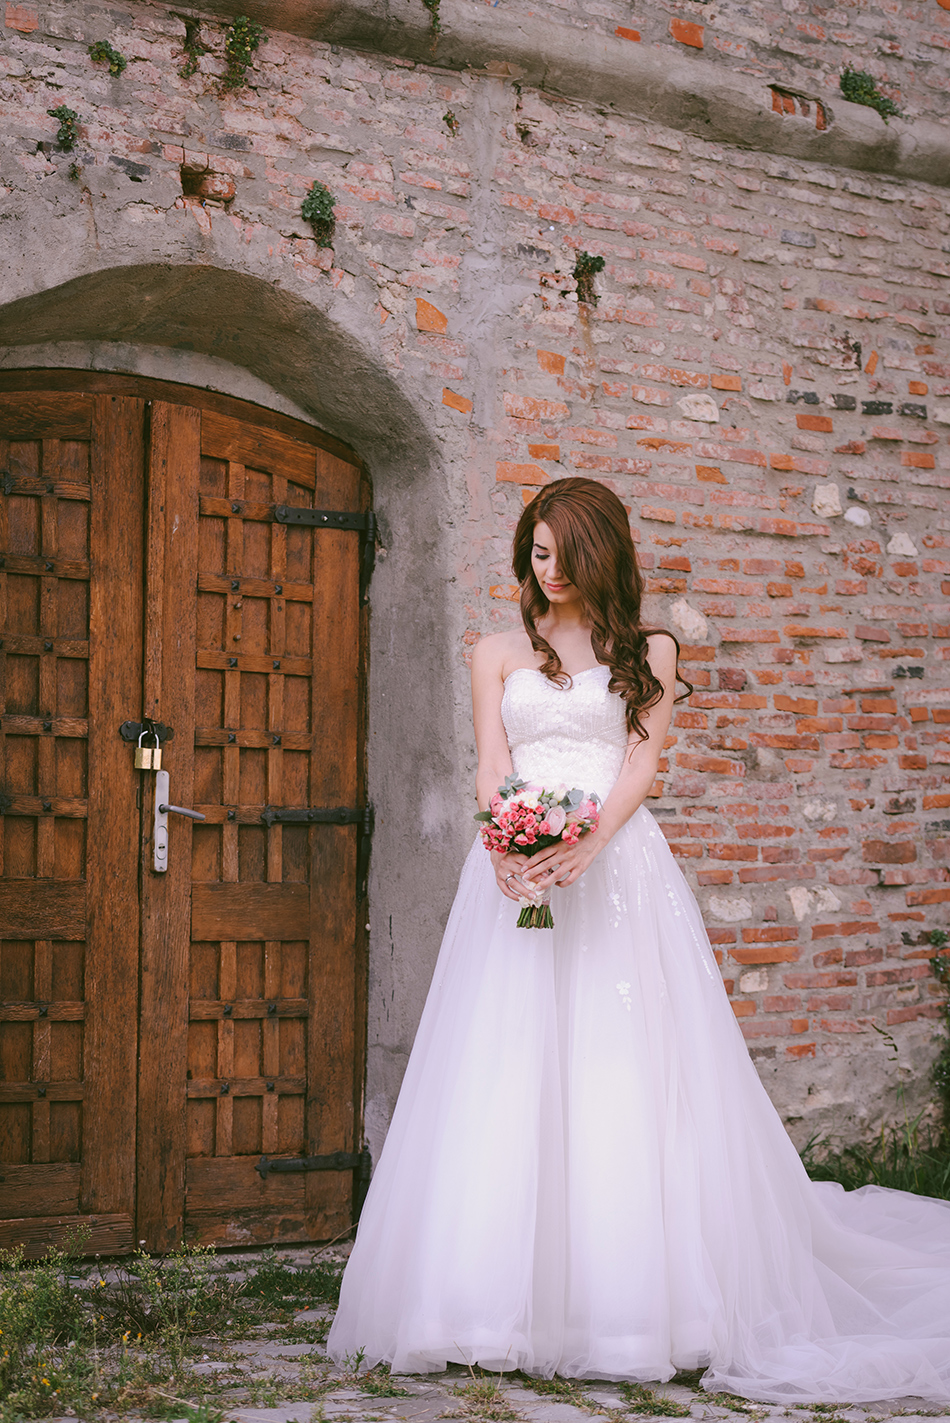 AD Passion Photography | fotograf-nunta-brasov-poiana-brasov-fotograf-profesionist_lorena-cristi_ttd_0004 | Adelin, Dida, fotograf profesionist, fotograf de nunta, fotografie de nunta, fotograf Timisoara, fotograf Craiova, fotograf Bucuresti, fotograf Arad, nunta Timisoara, nunta Arad, nunta Bucuresti, nunta Craiova